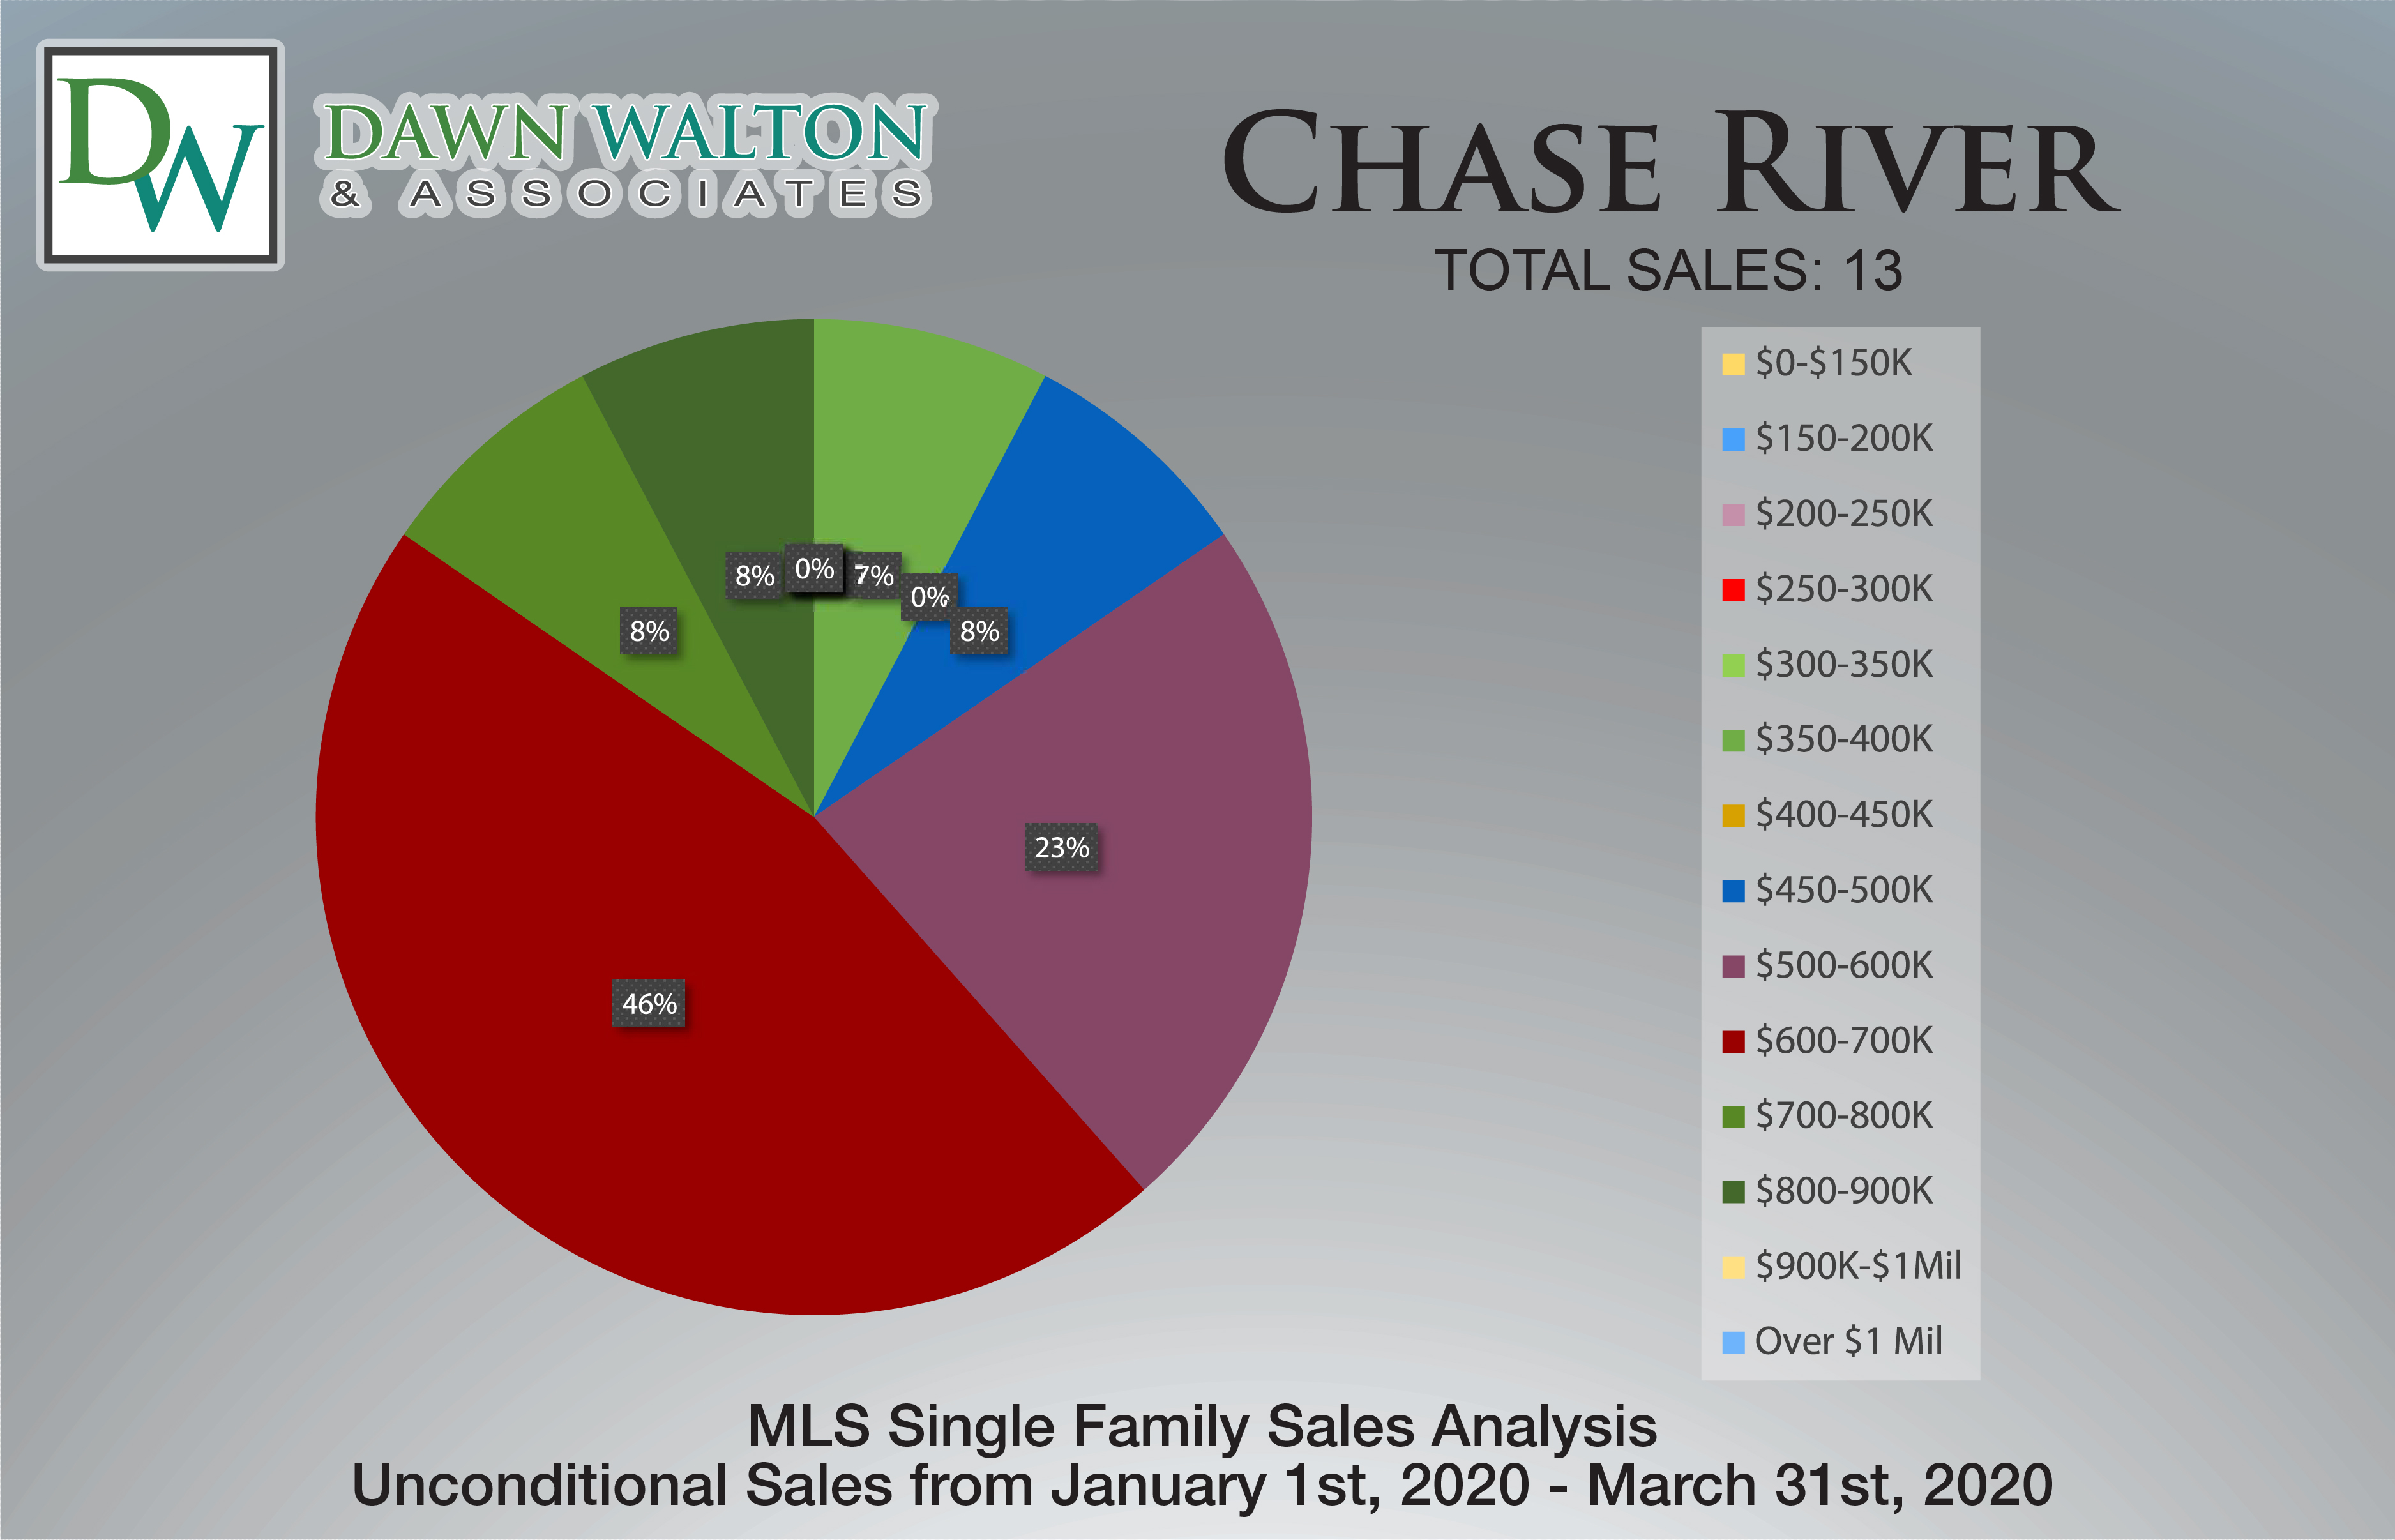 Chase River Real Estate Market Stats Price Percentage Jan 1-Mar 31 2020 - Nanaimo Realtor Dawn Walton